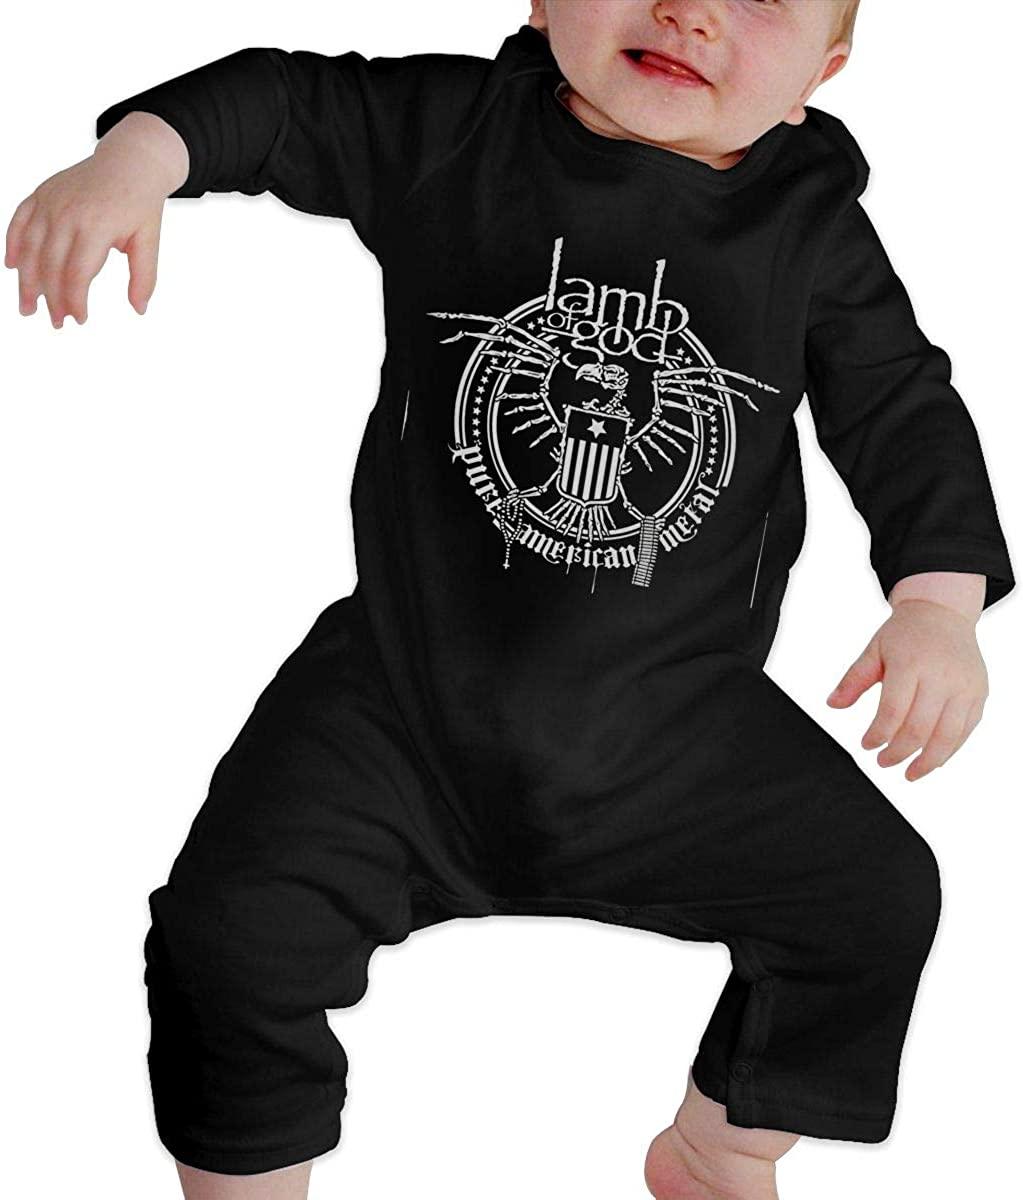 Baby Lamb of God Pure American Metal Long Sleeve Jumpsuit